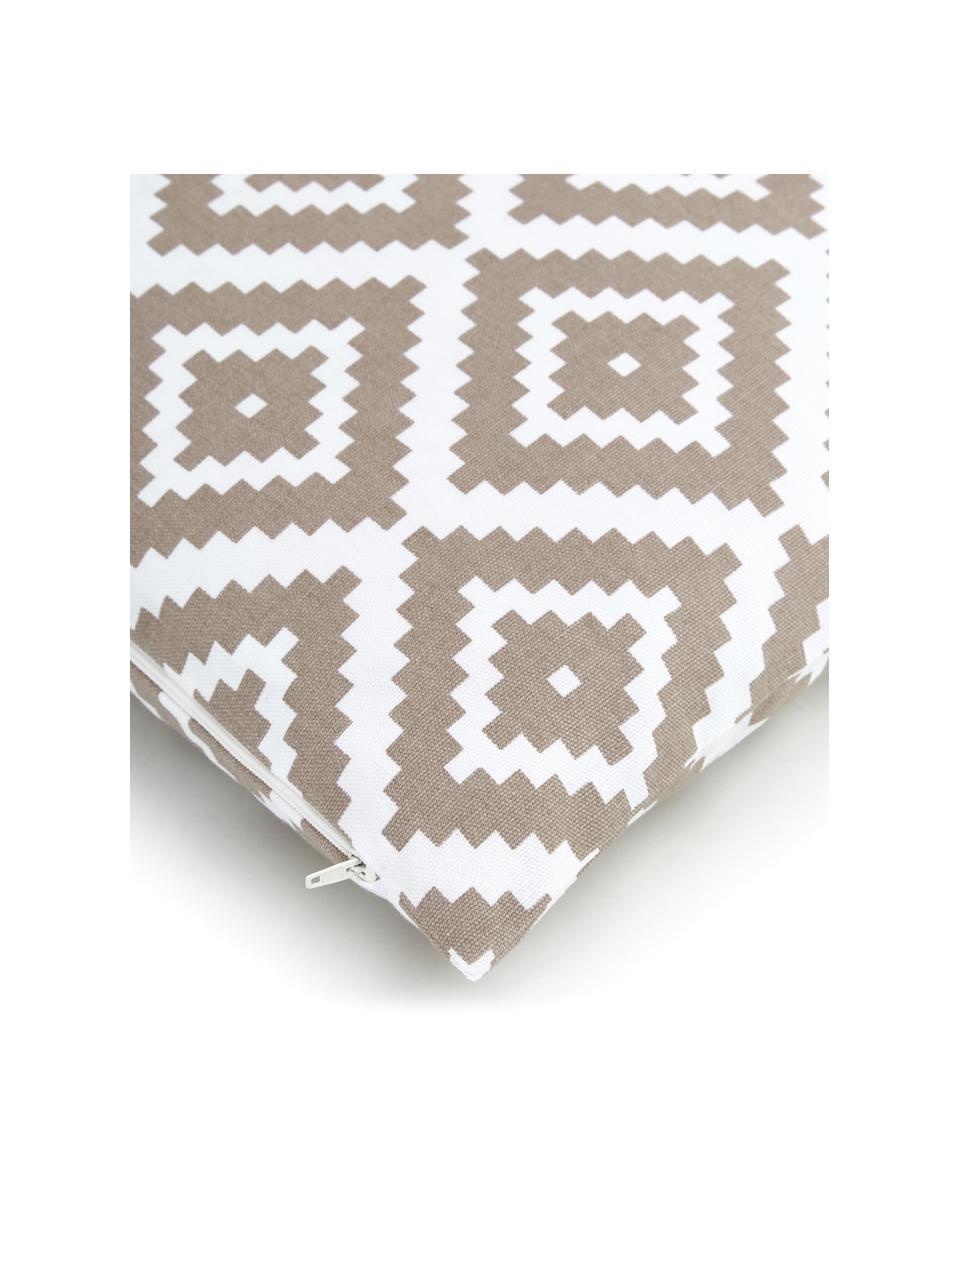 Federa arredo taupe/bianco Miami, 100% cotone, Beige, Larg. 45 x Lung. 45 cm